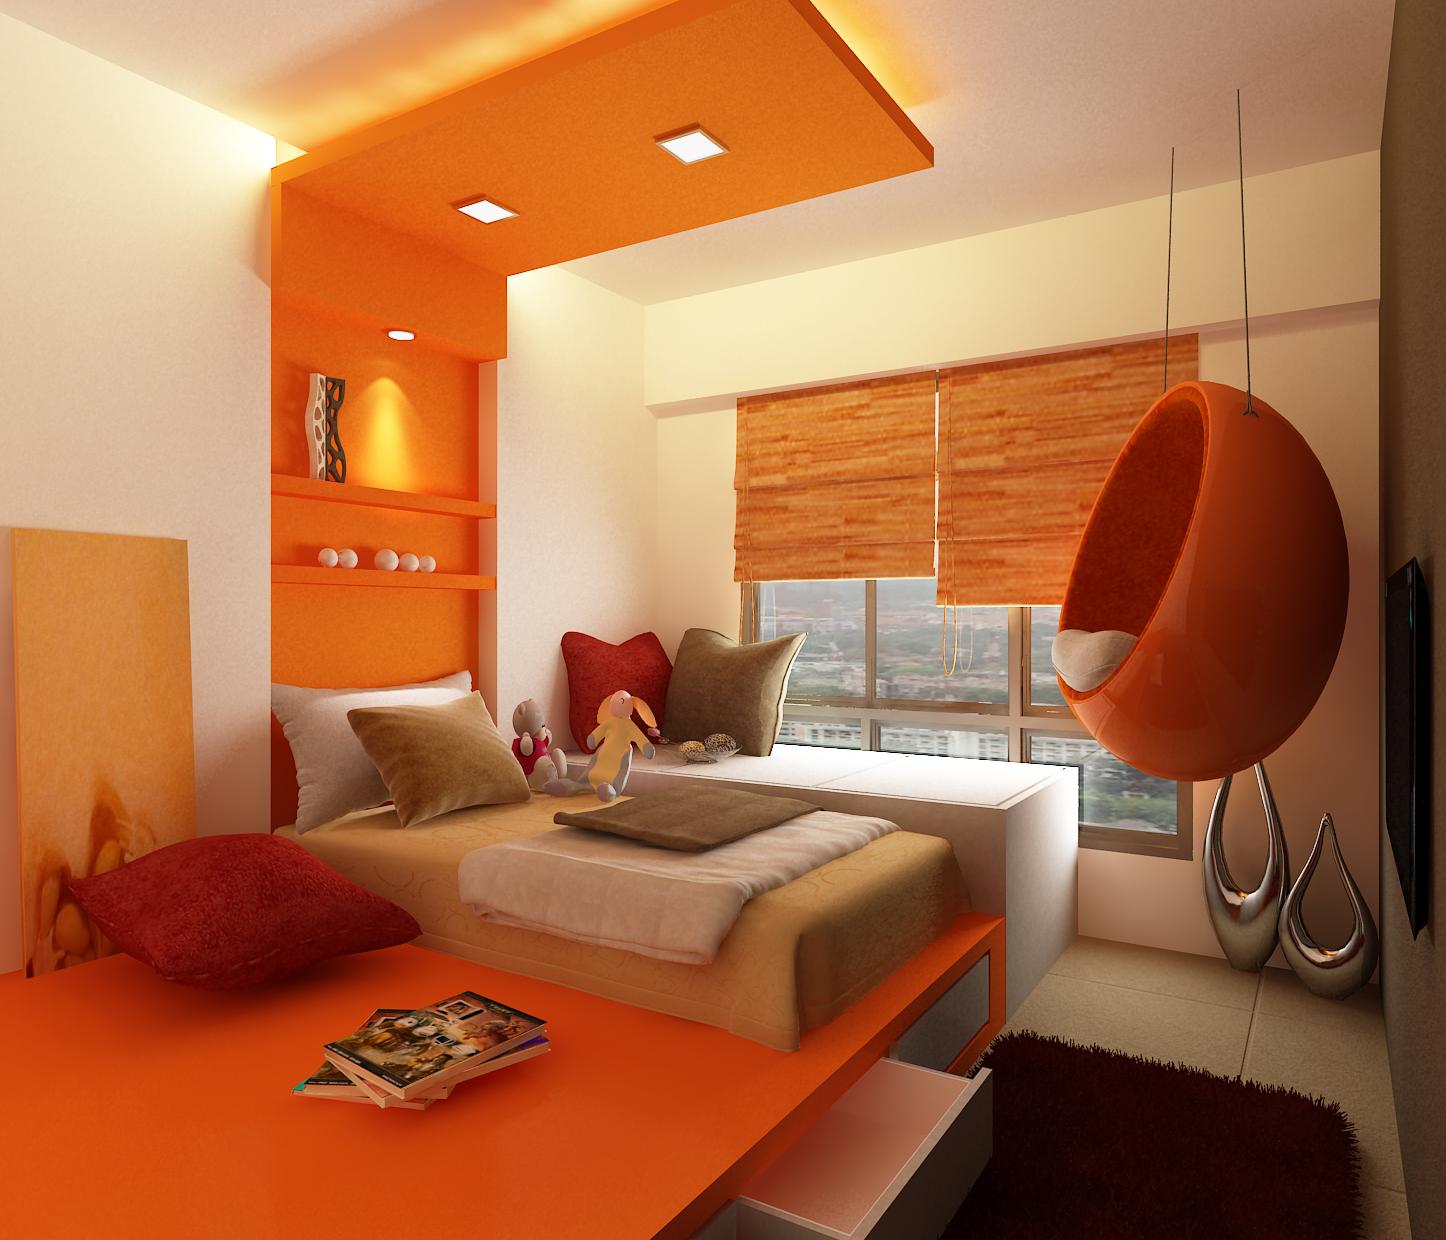 Home Interior Design Job Outlook